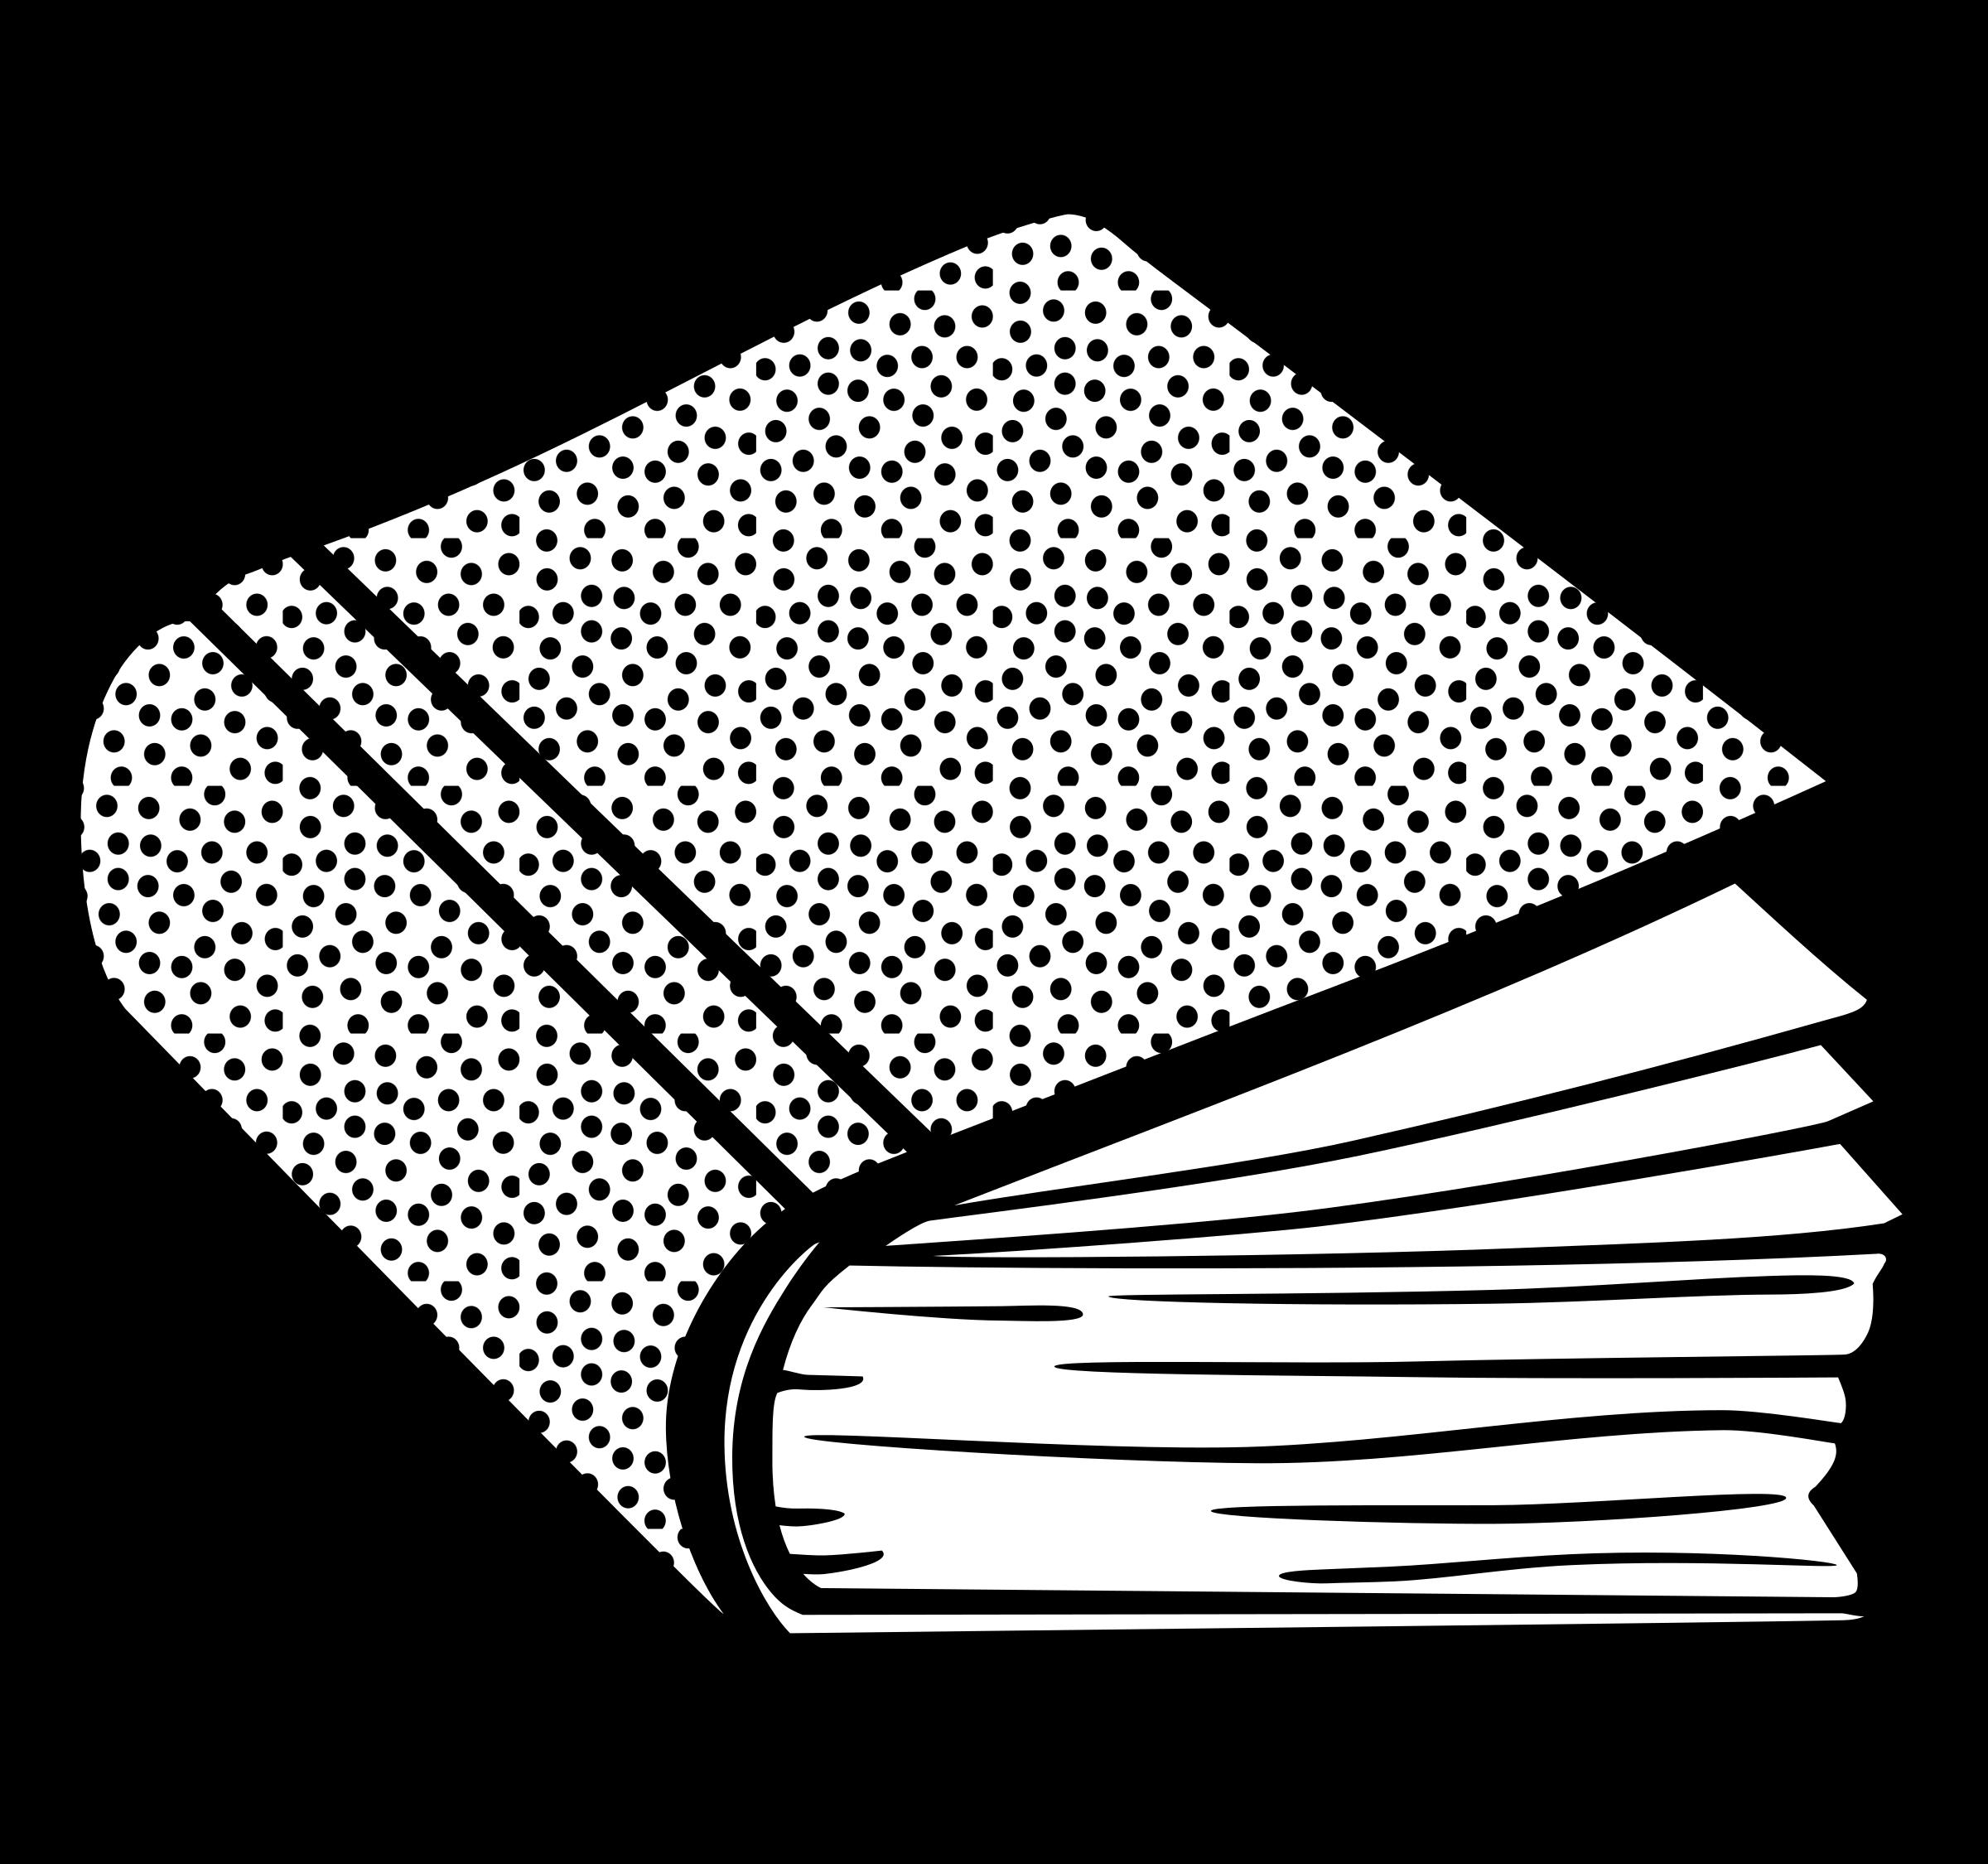 Clipart art book clipart download Clipart - book - lineart clipart download